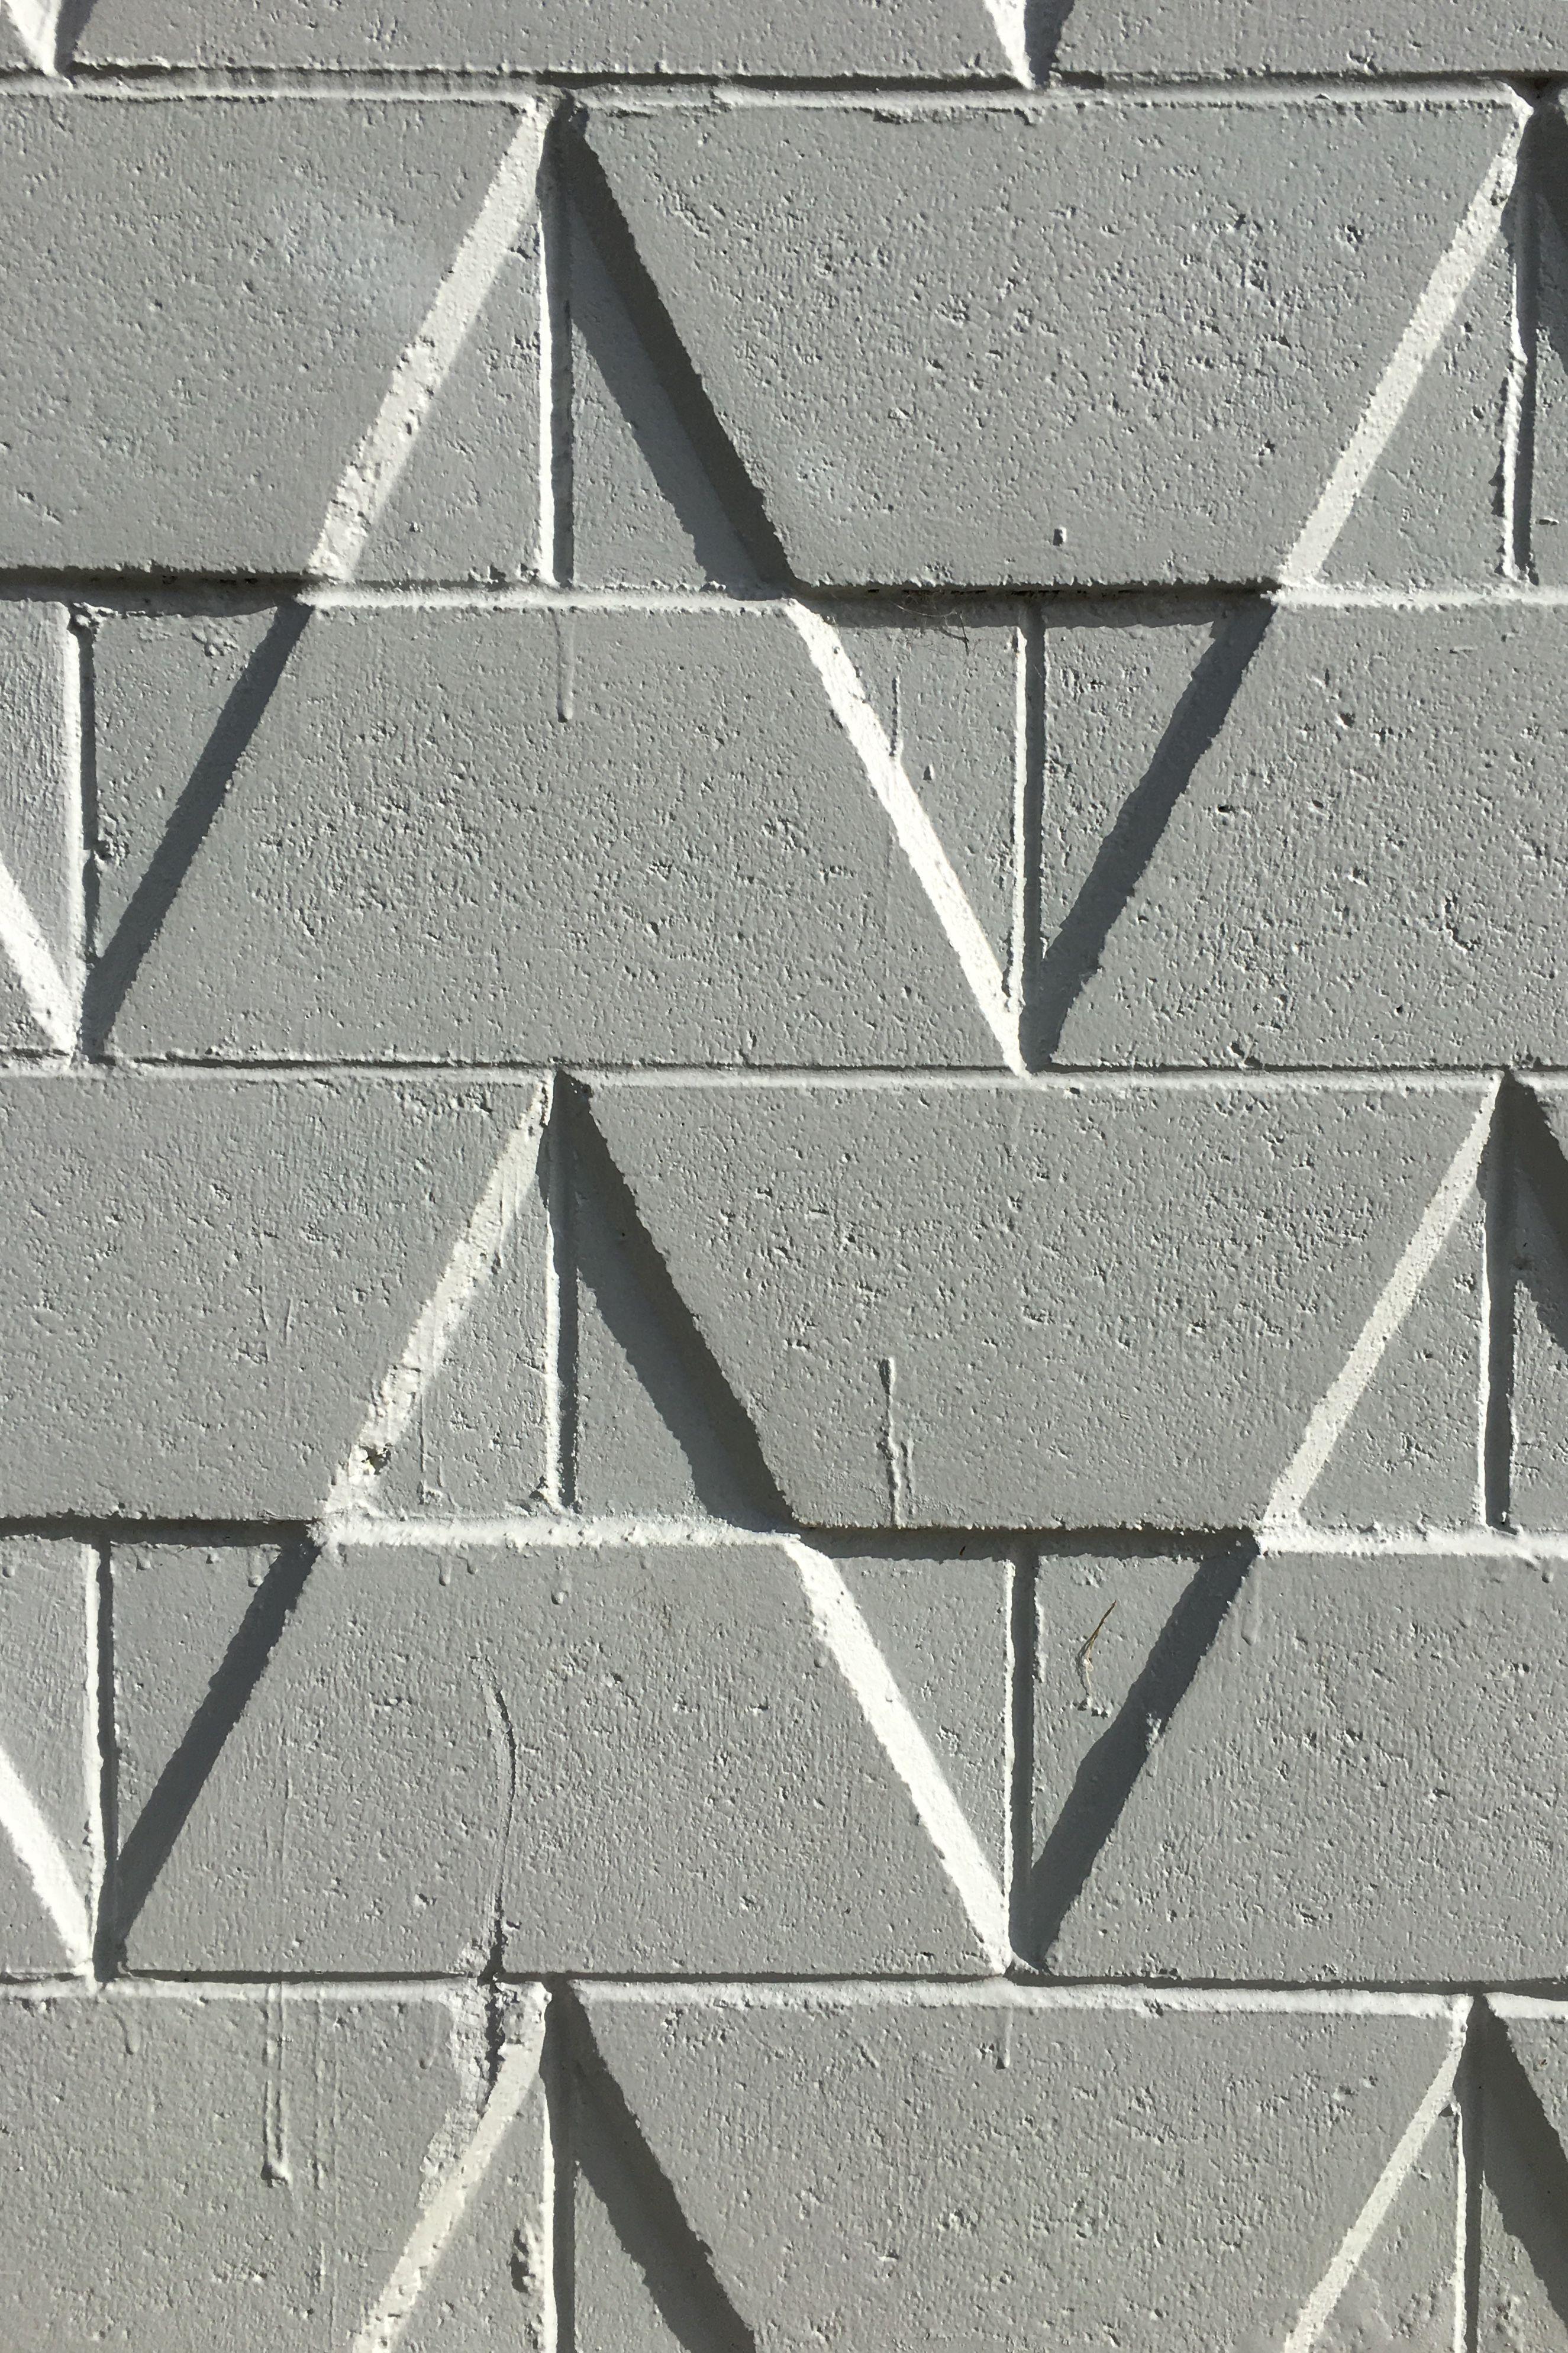 Concrete Block Wall Photo By Amanda Wilkinson Www Amandawilkinsonart Com Inspiration For My Art Which I Concrete Block Walls Black Wall Art Facade Pattern